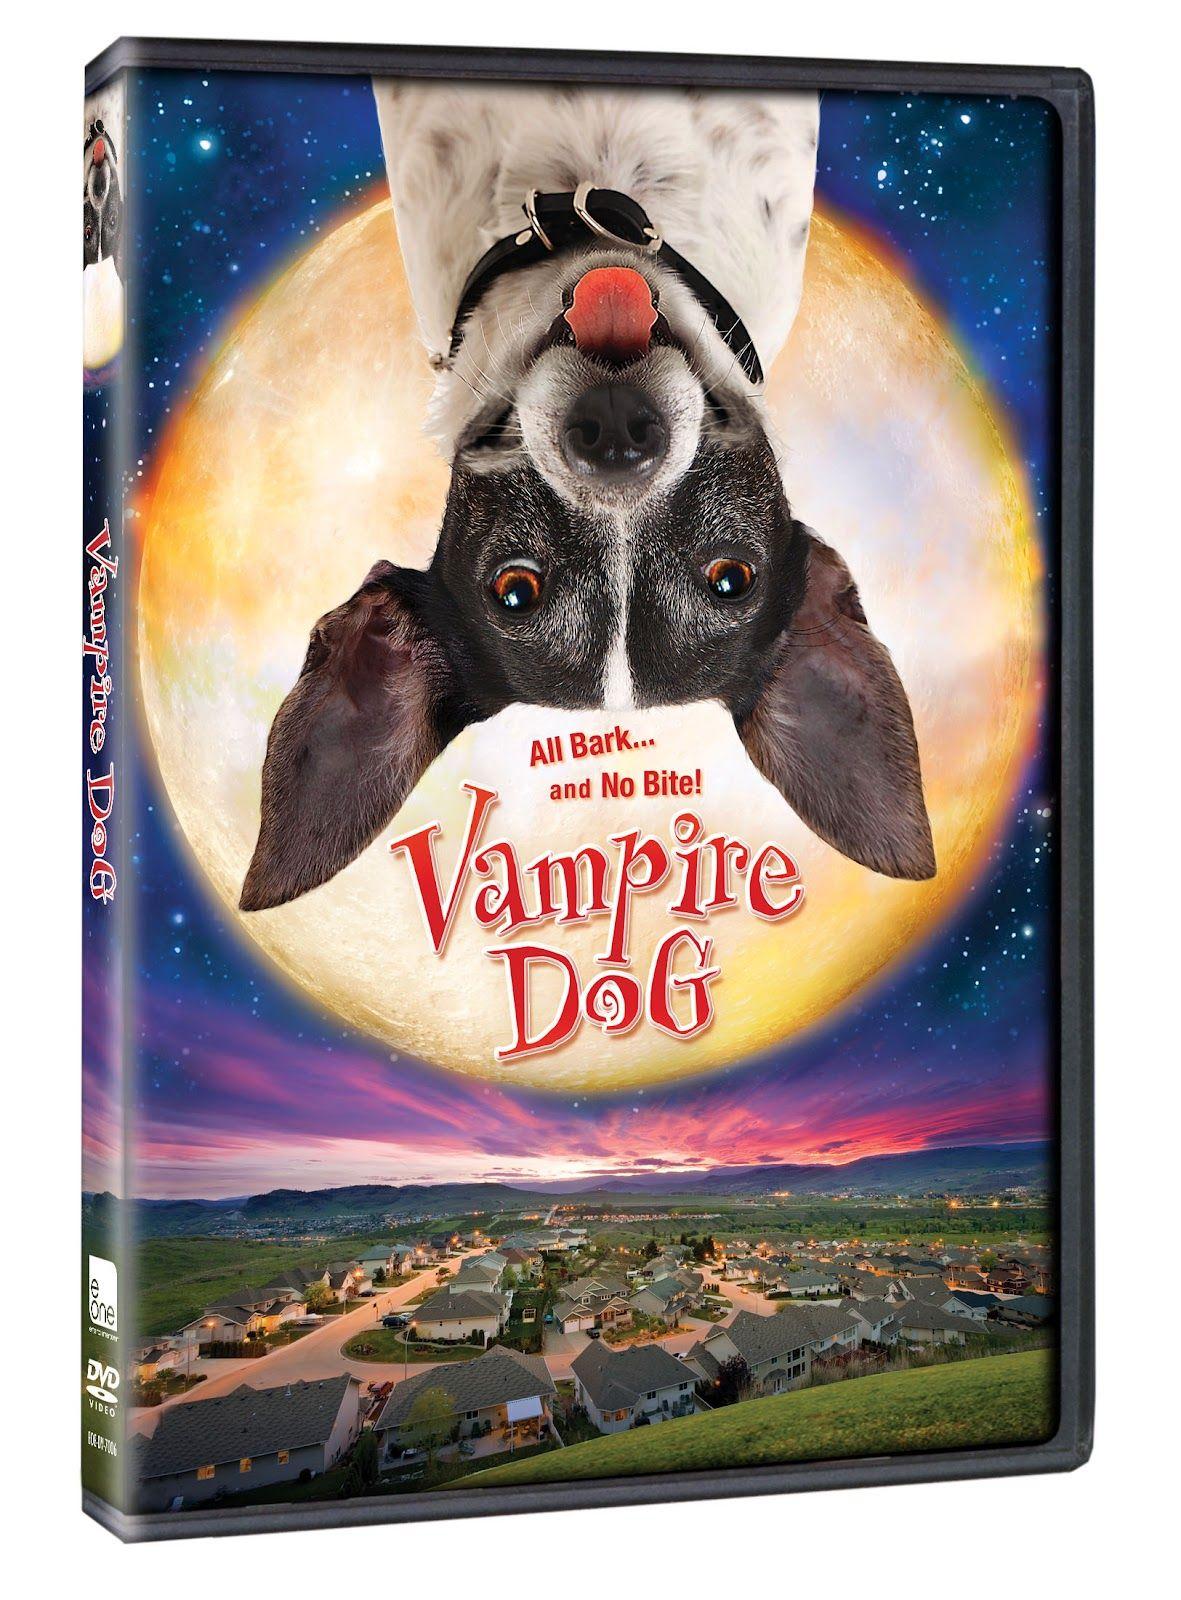 VAMPIRE DOG airs this Halloween on Disney XD. >>> Be sure